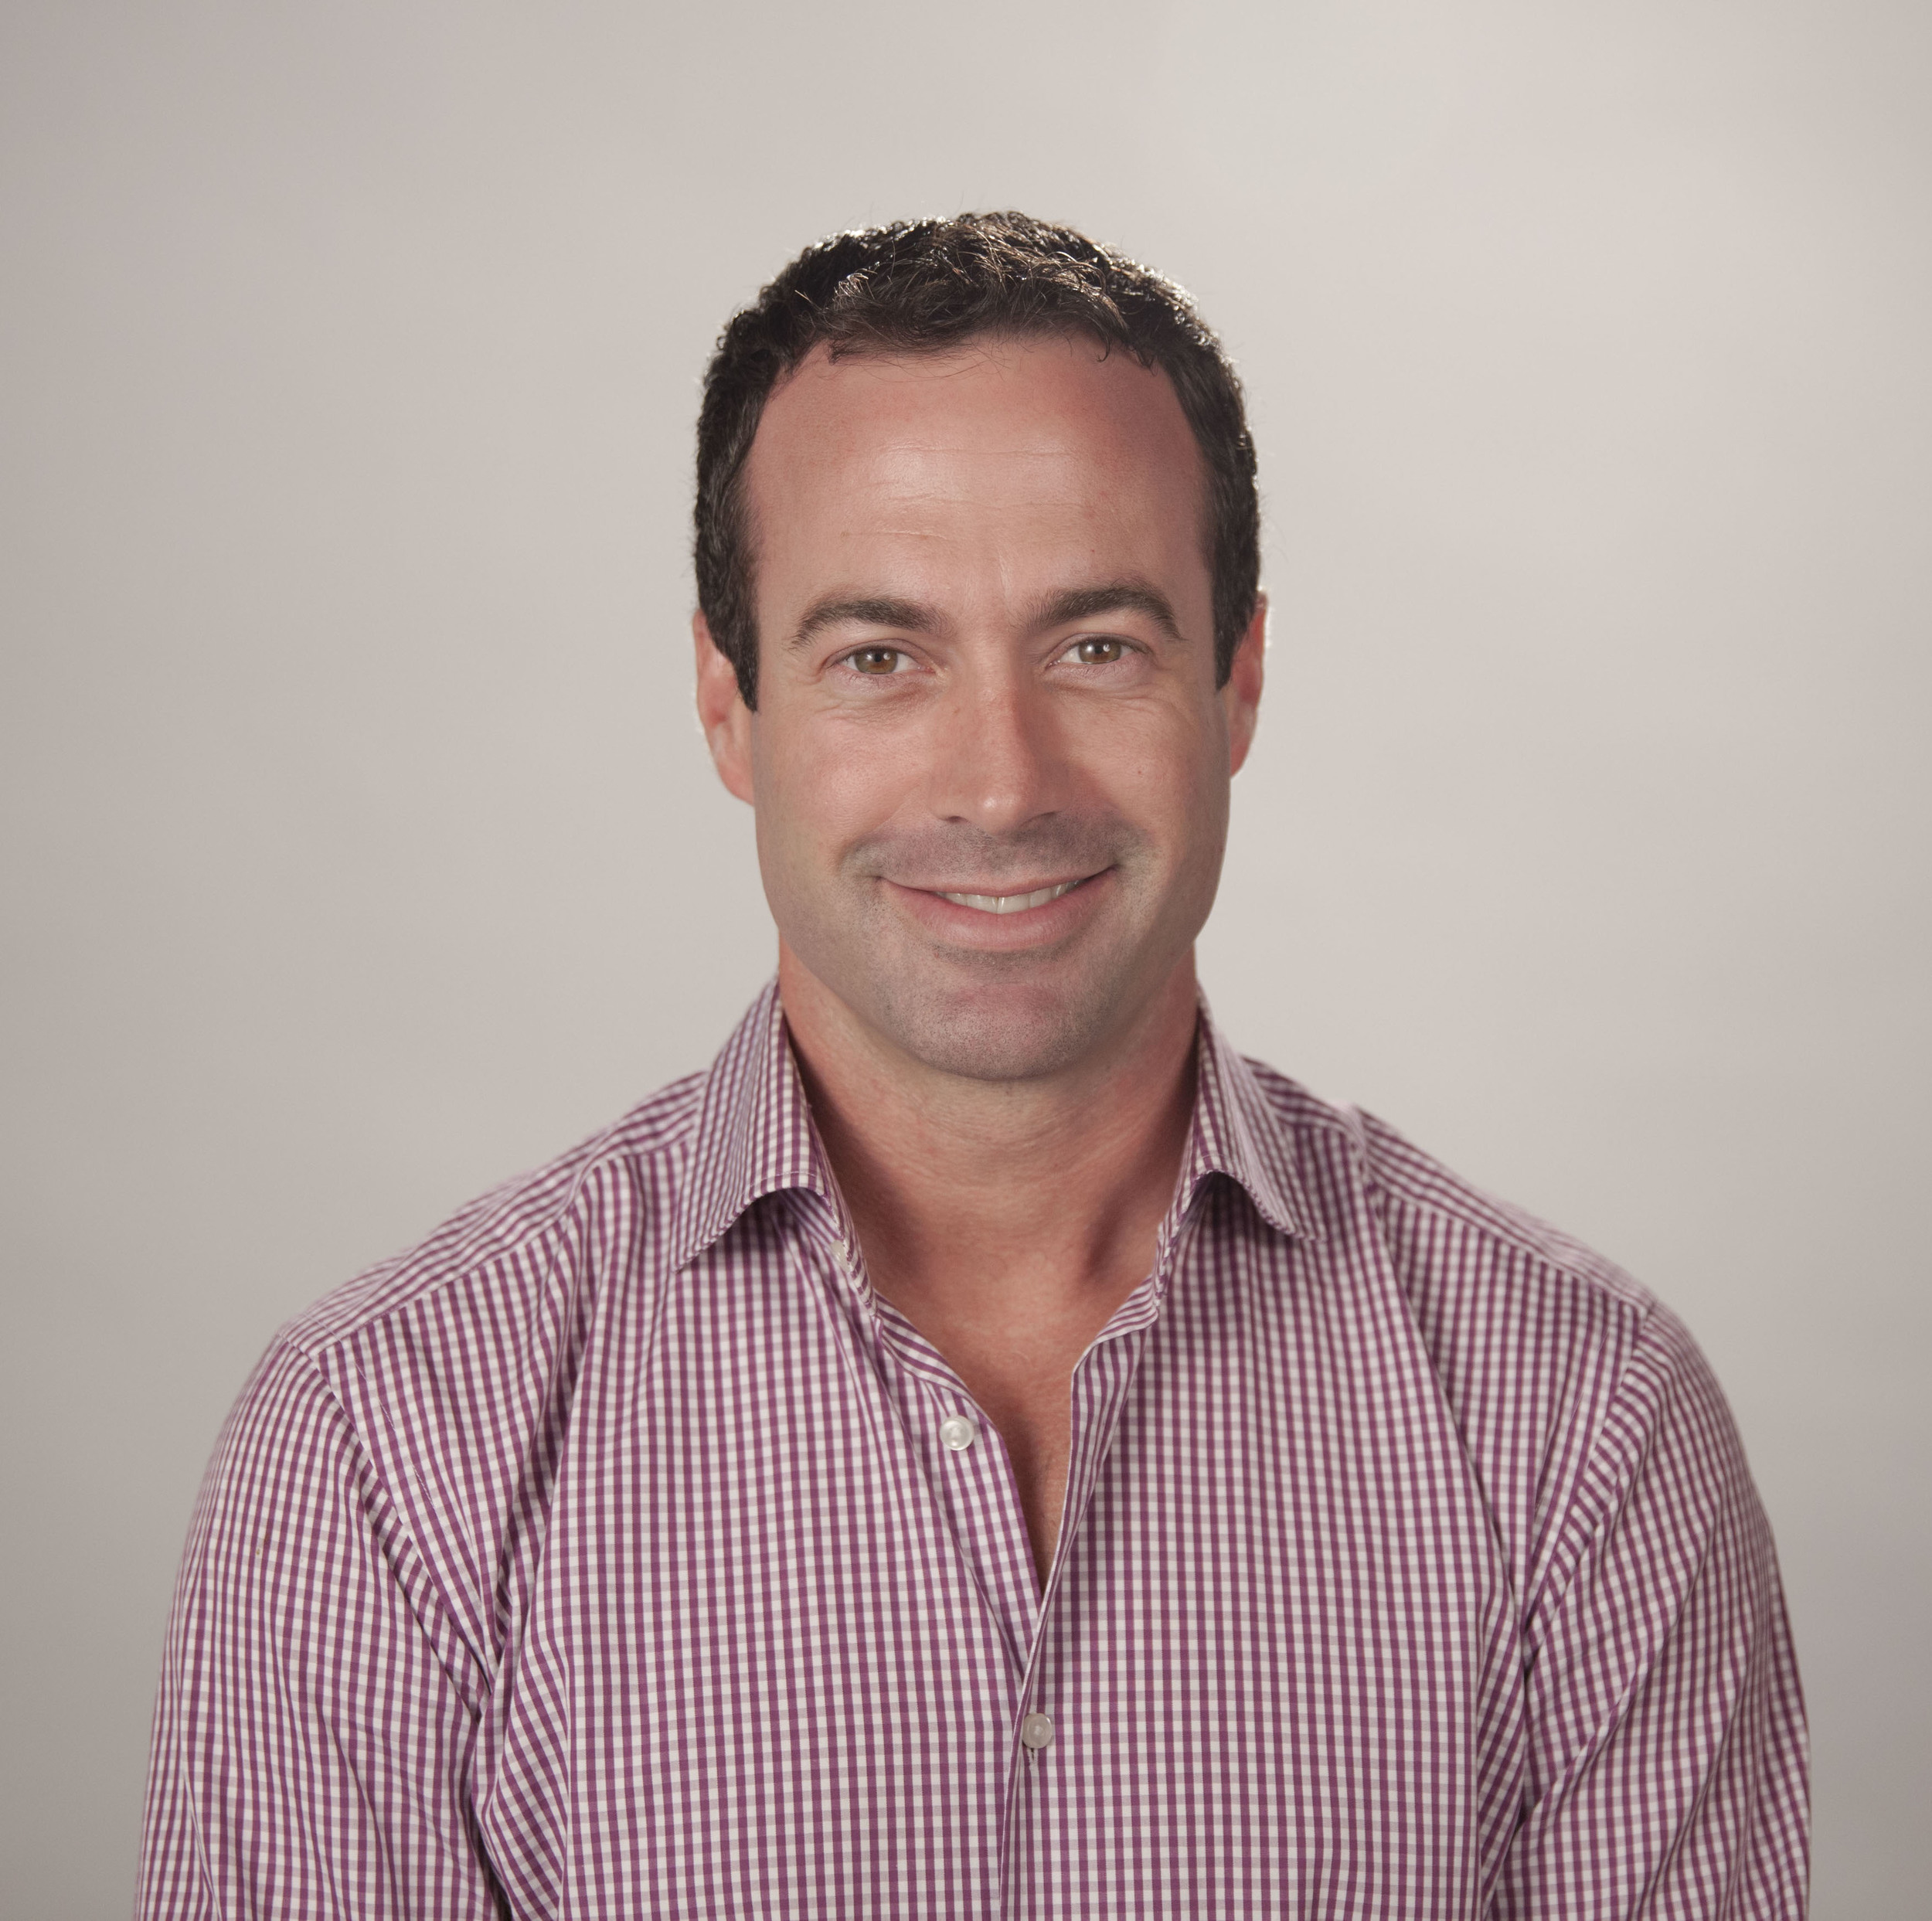 Mateo Ocejo - Director